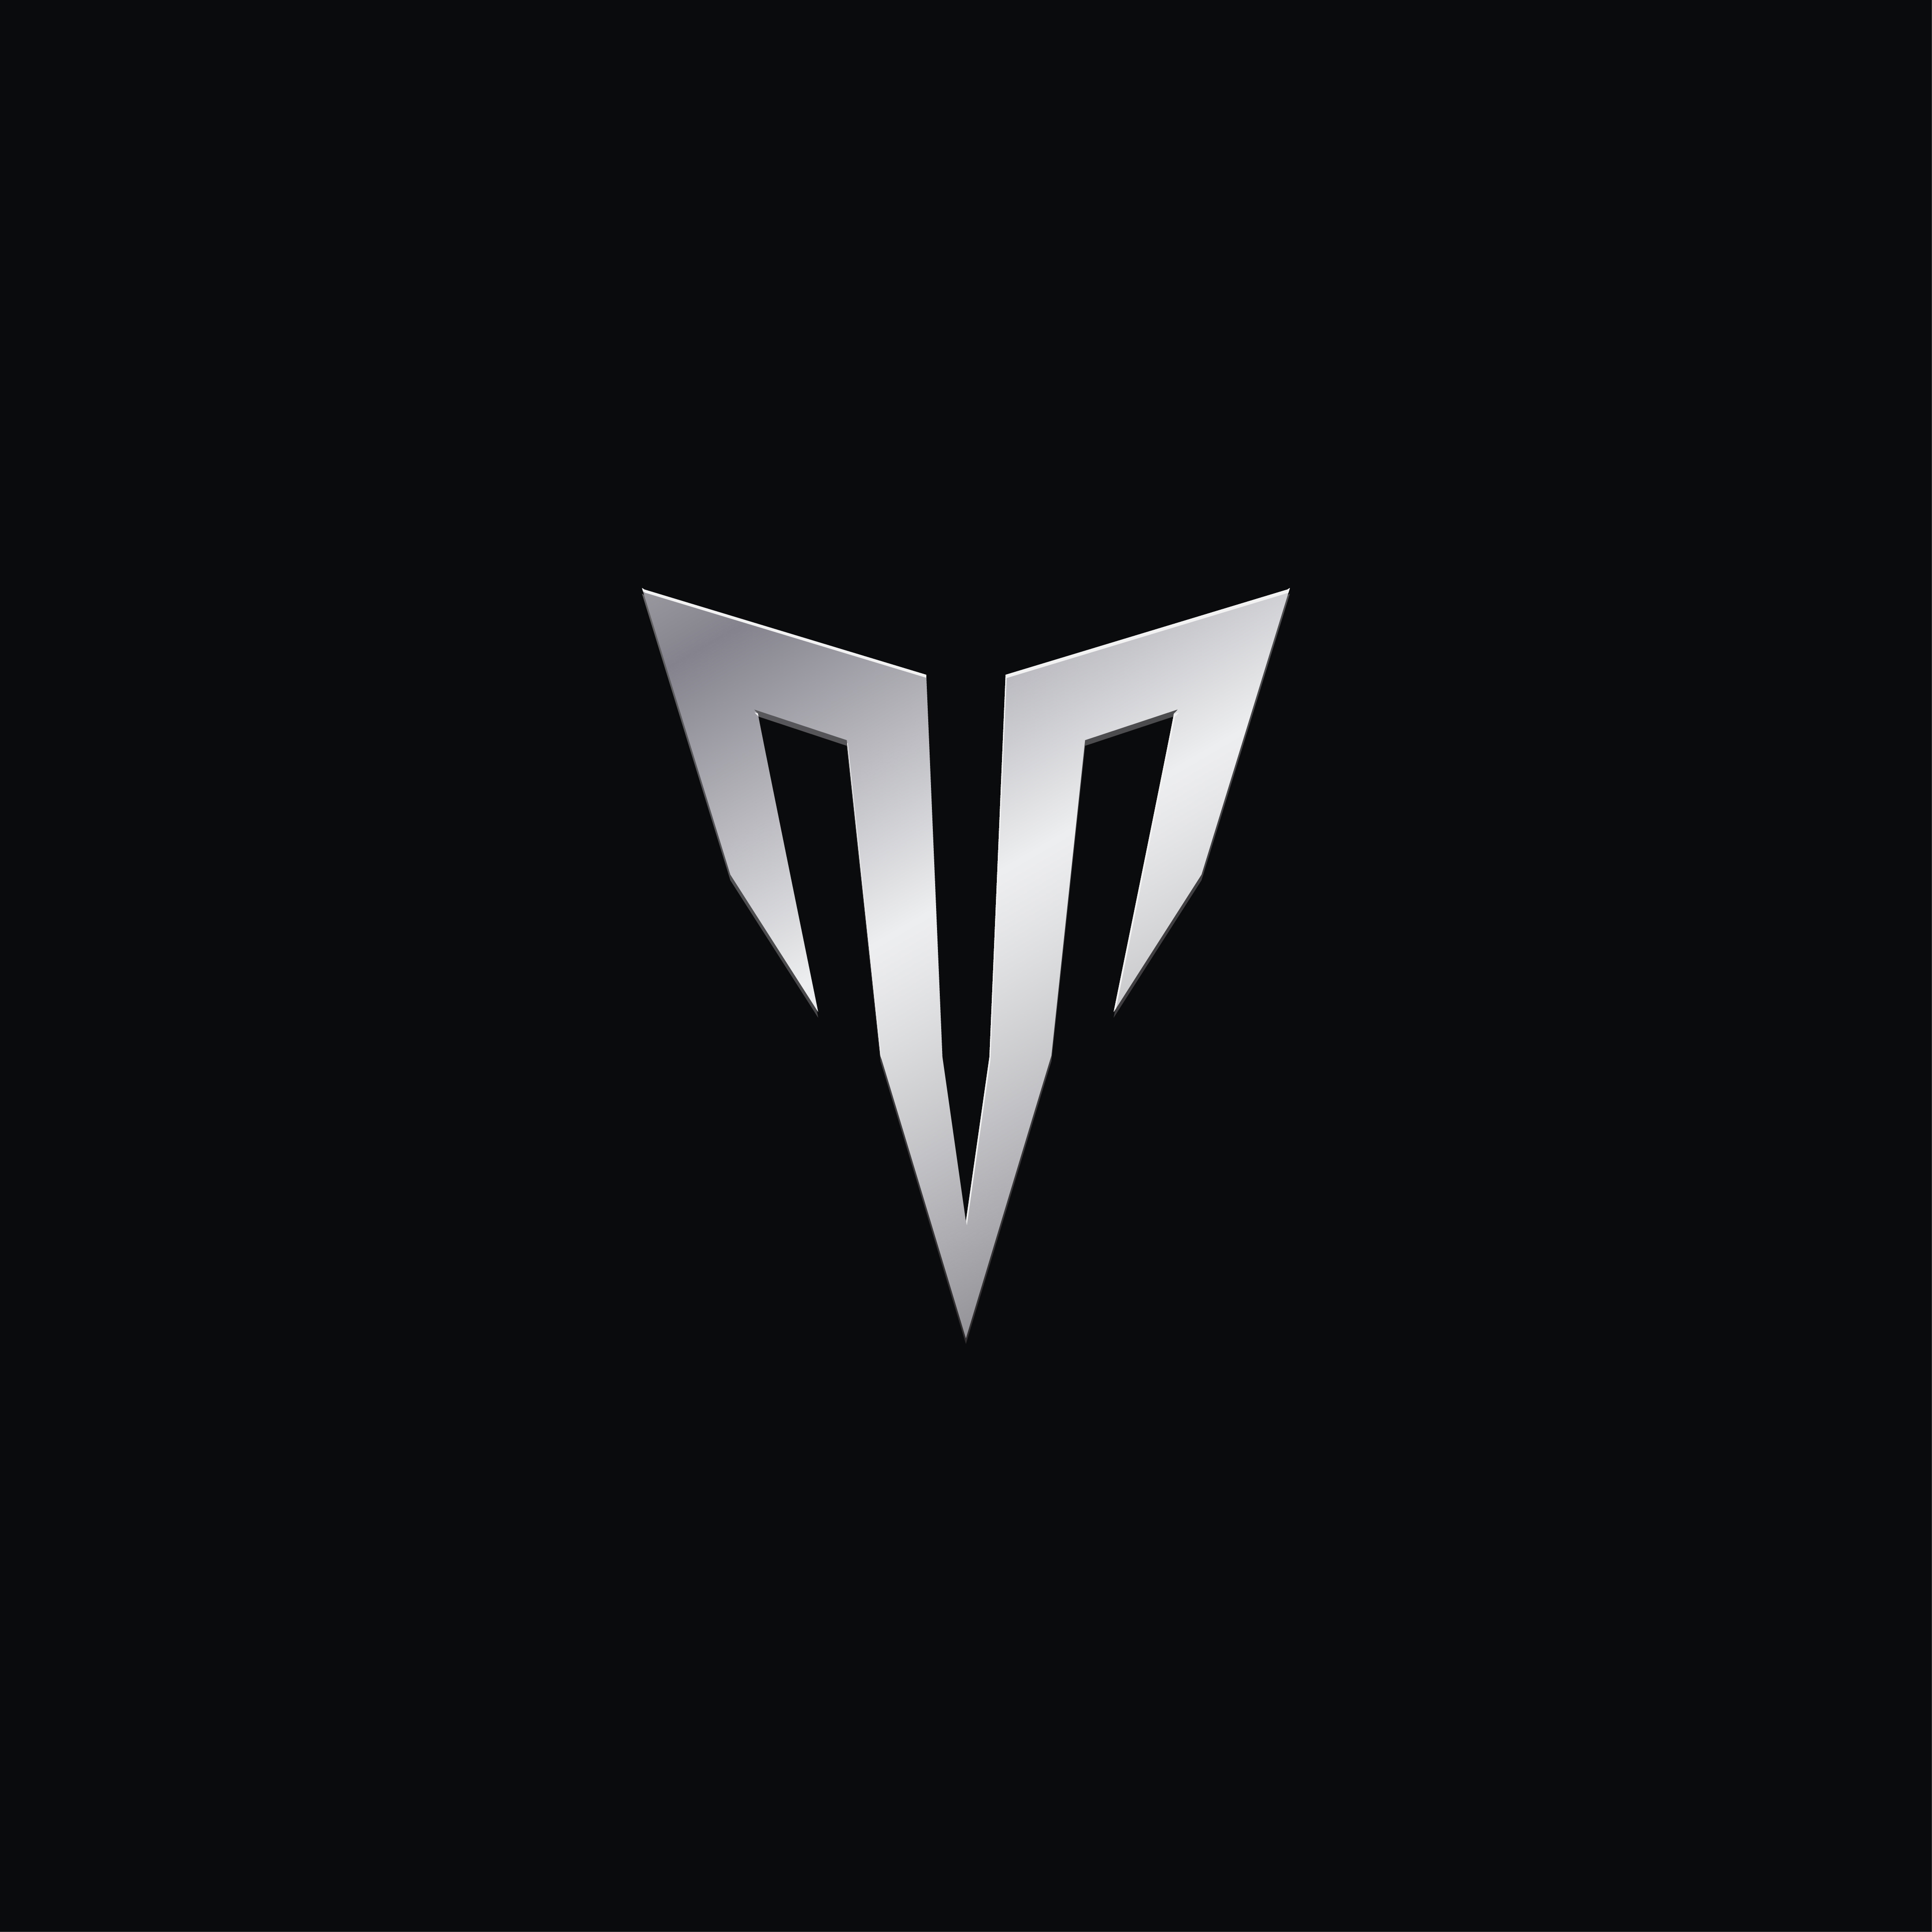 Creative Luxury Letter T Logo Concept Design 562543 Vector